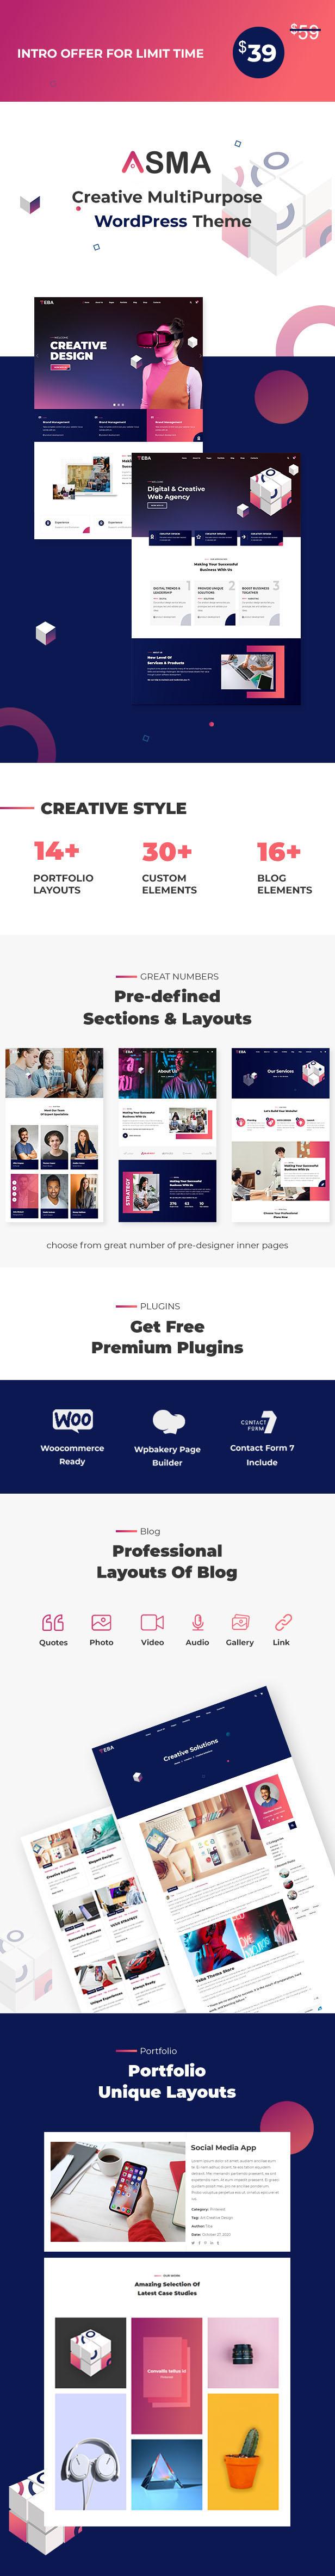 Asma - Thème WordPress pour Agence Créative - 1